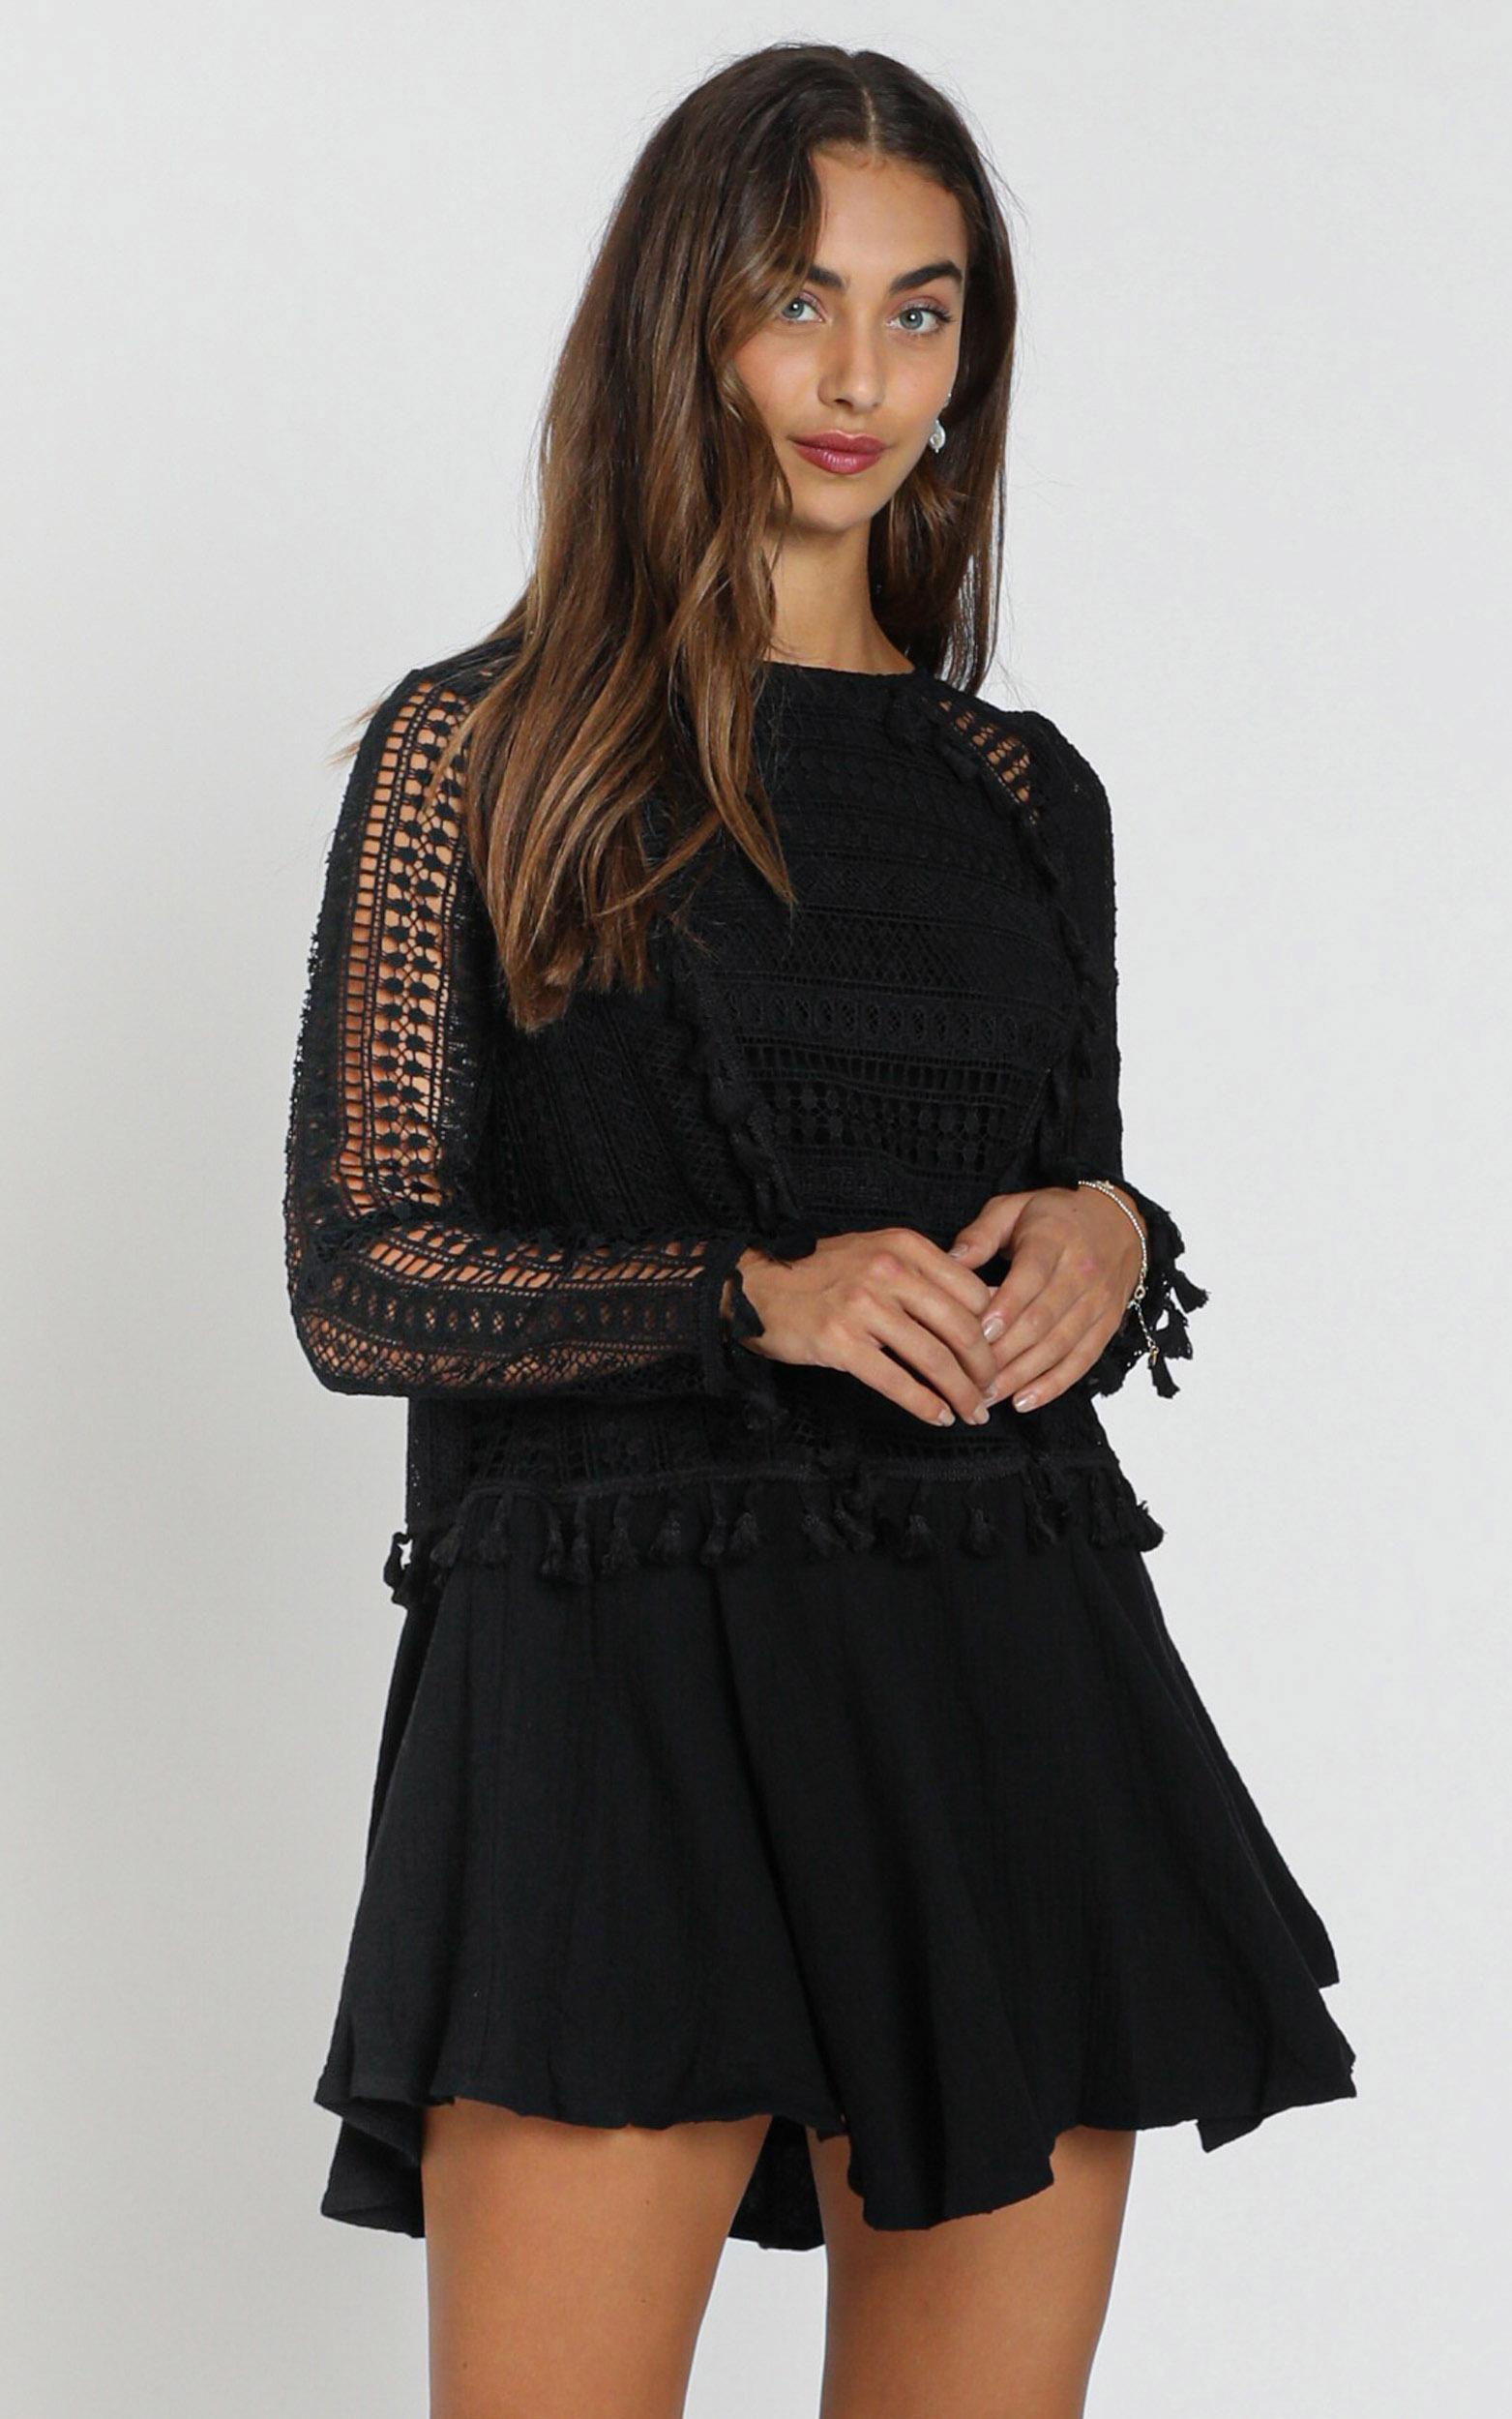 Bodhi Crochet Detail Dress in black - 6 (XS), Black, hi-res image number null